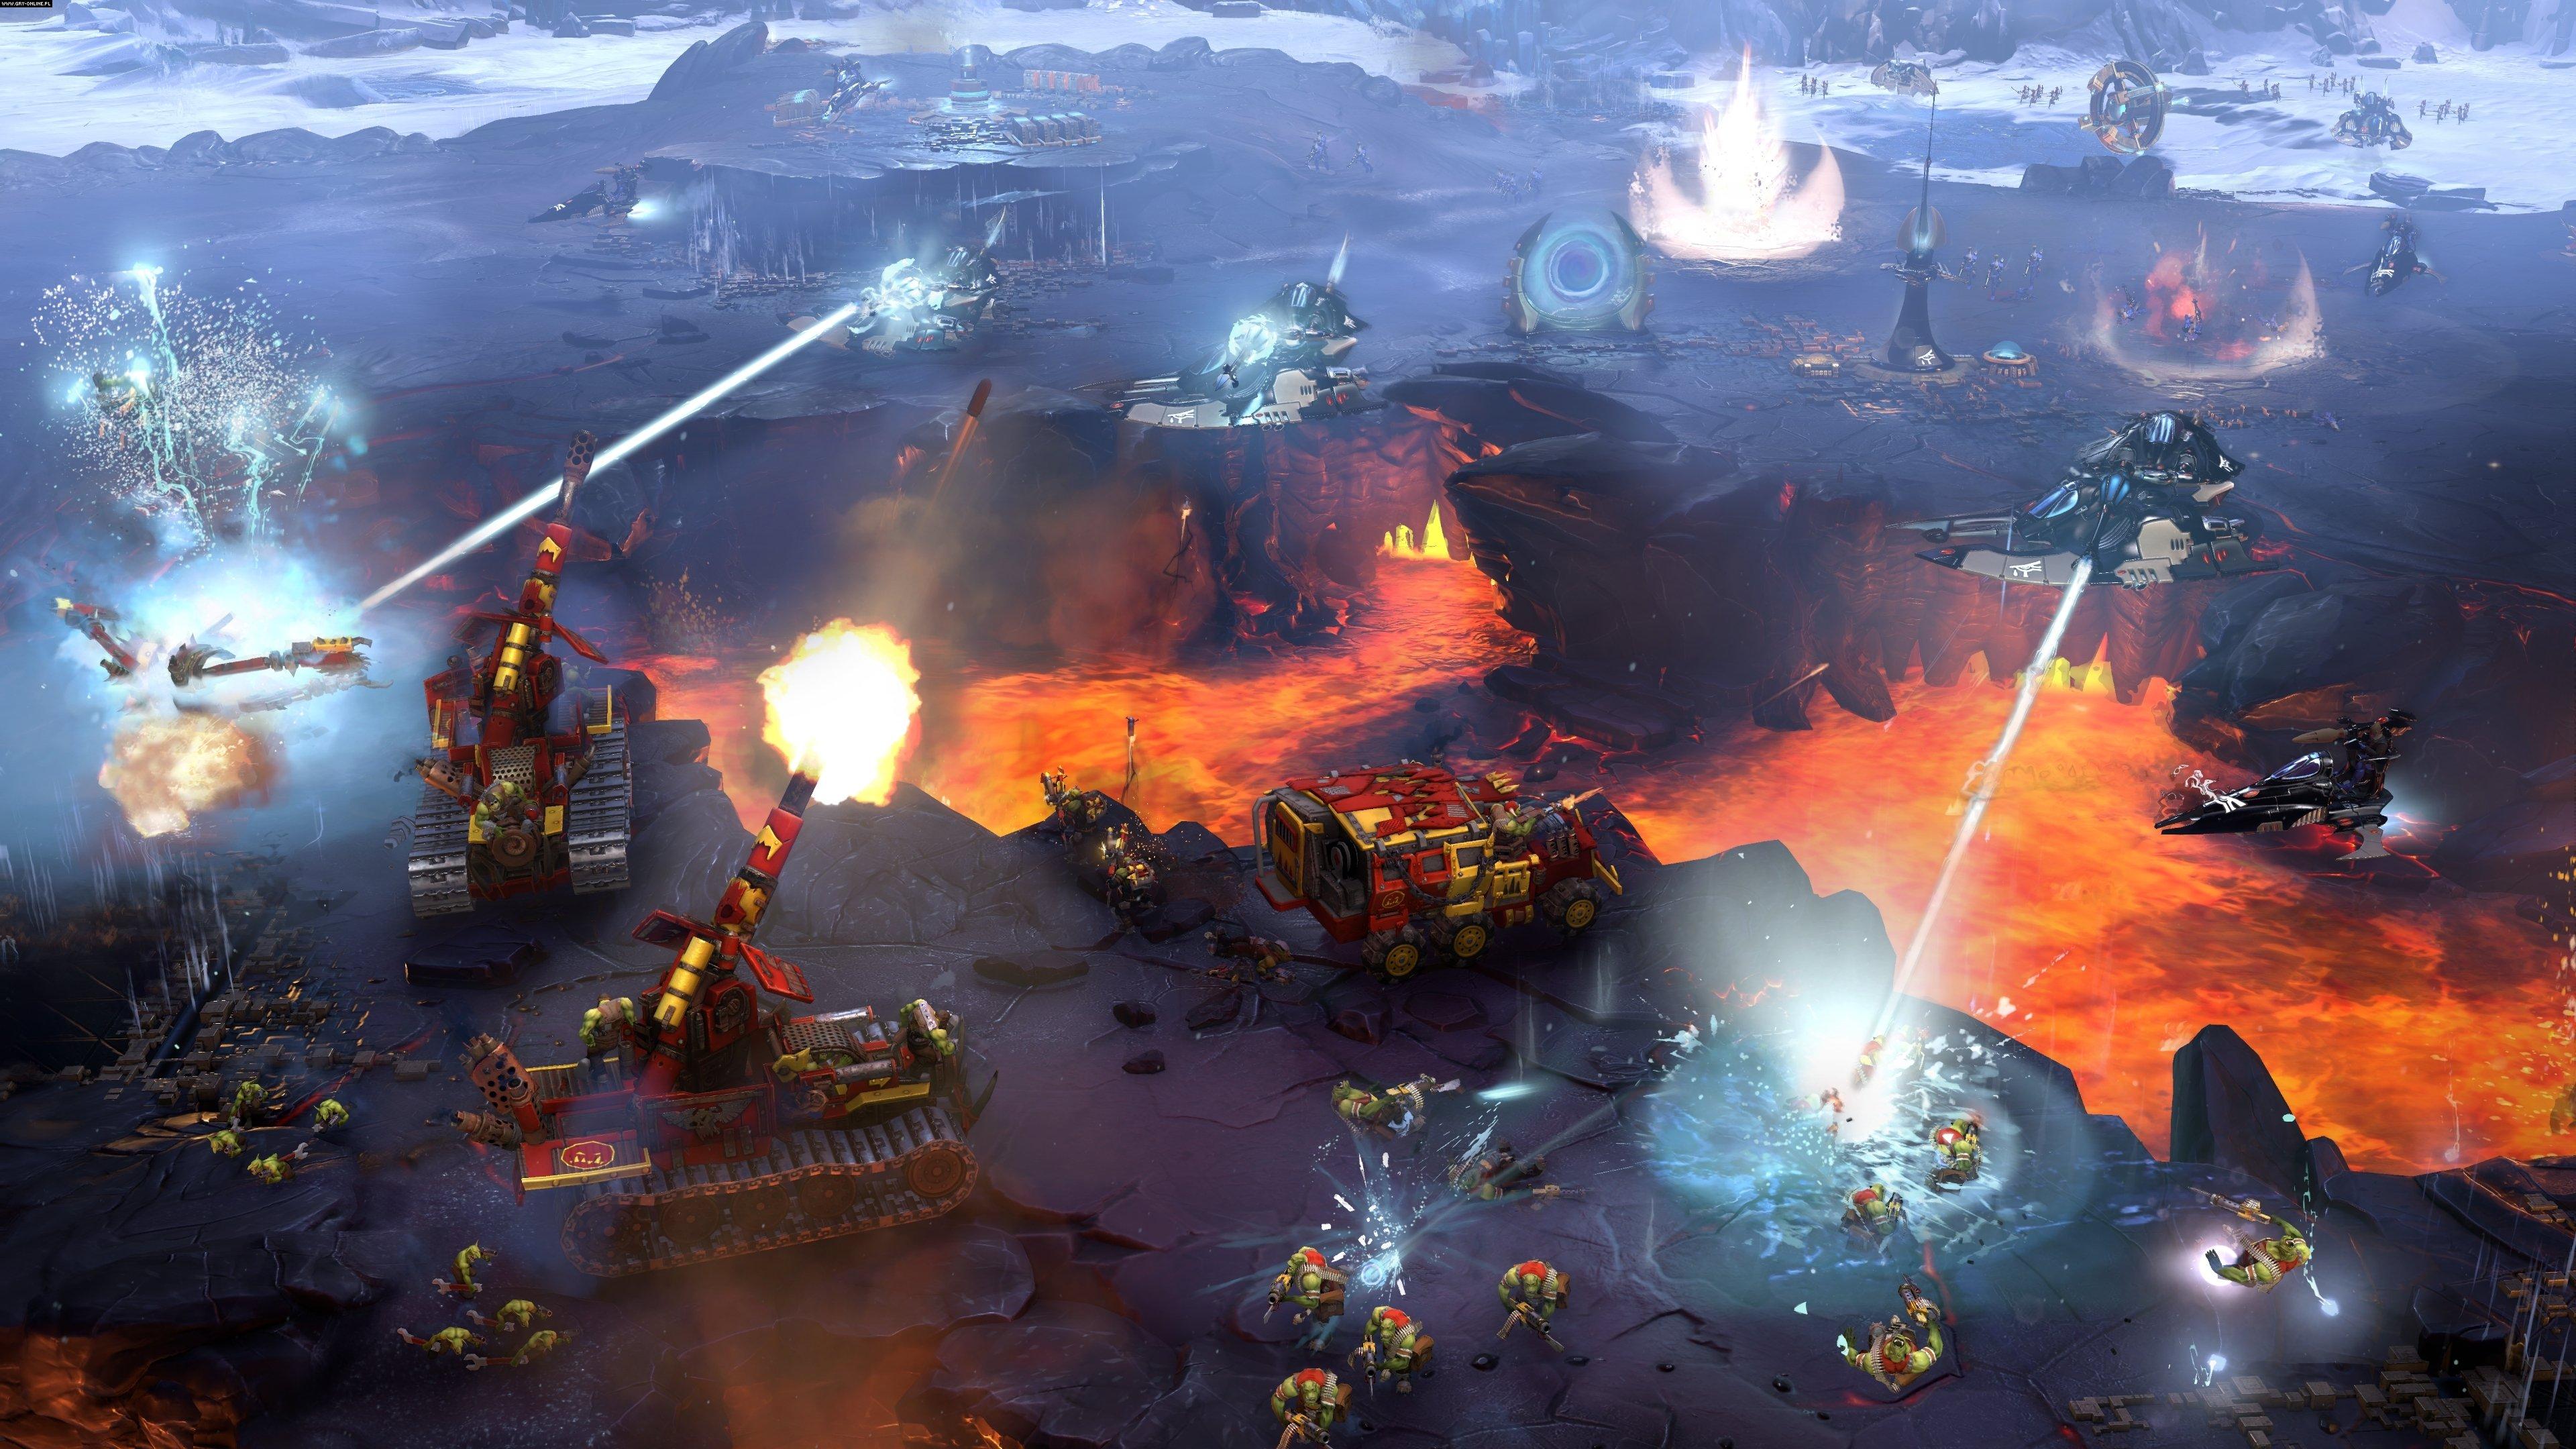 Warhammer 40,000: Dawn of War III PC Games Image 7/32, Relic Entertainment, SEGA